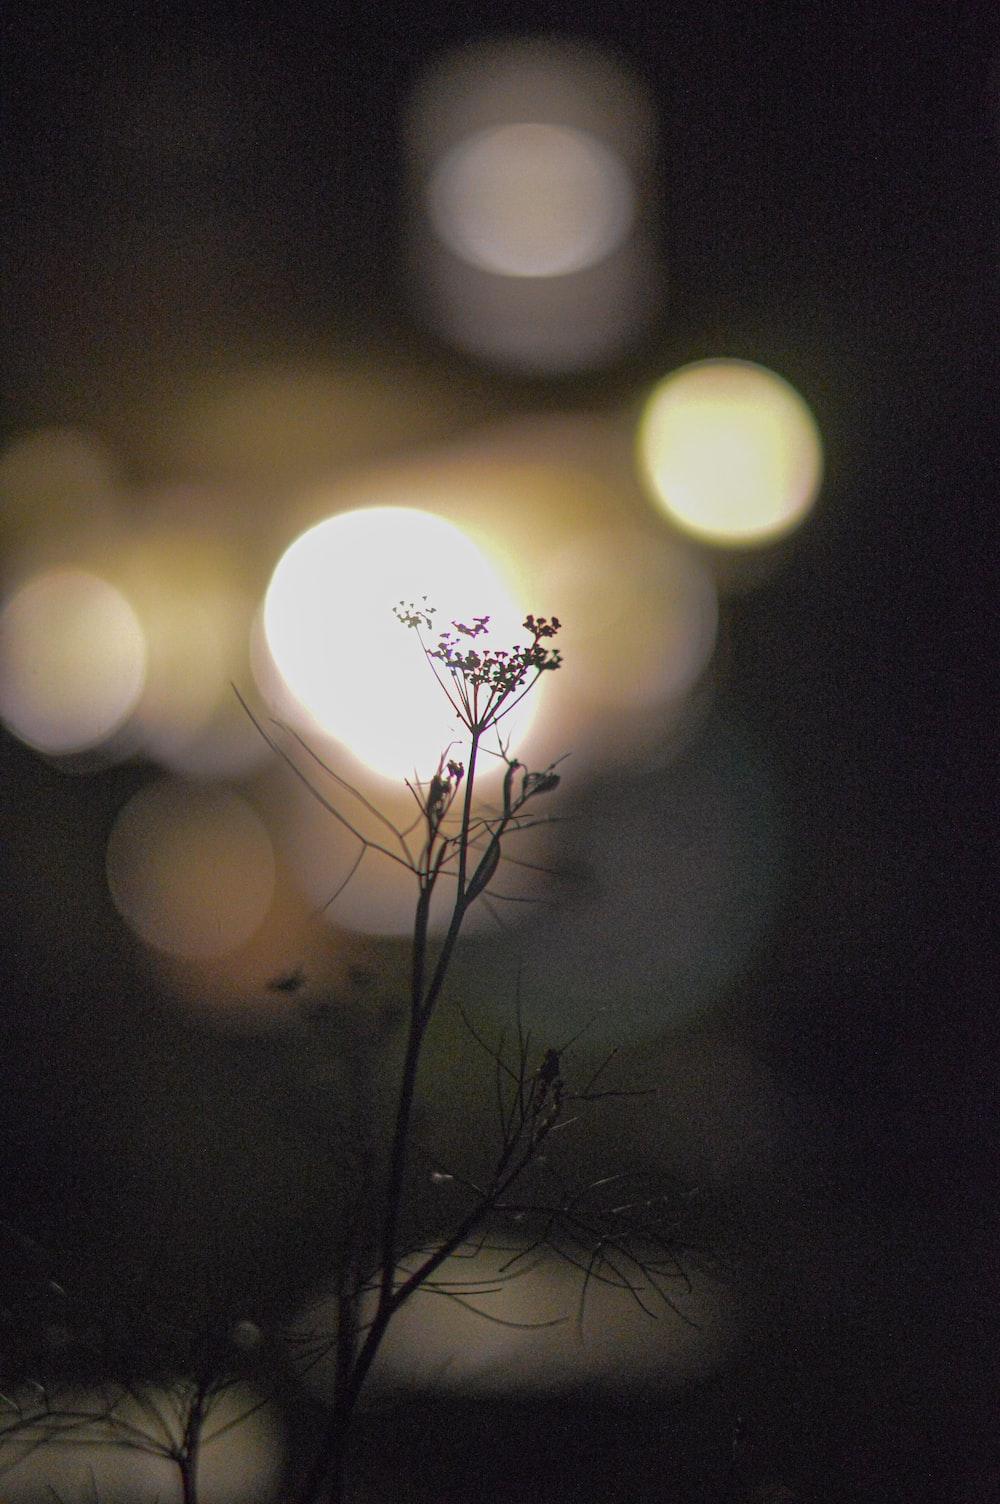 white flower with black stem